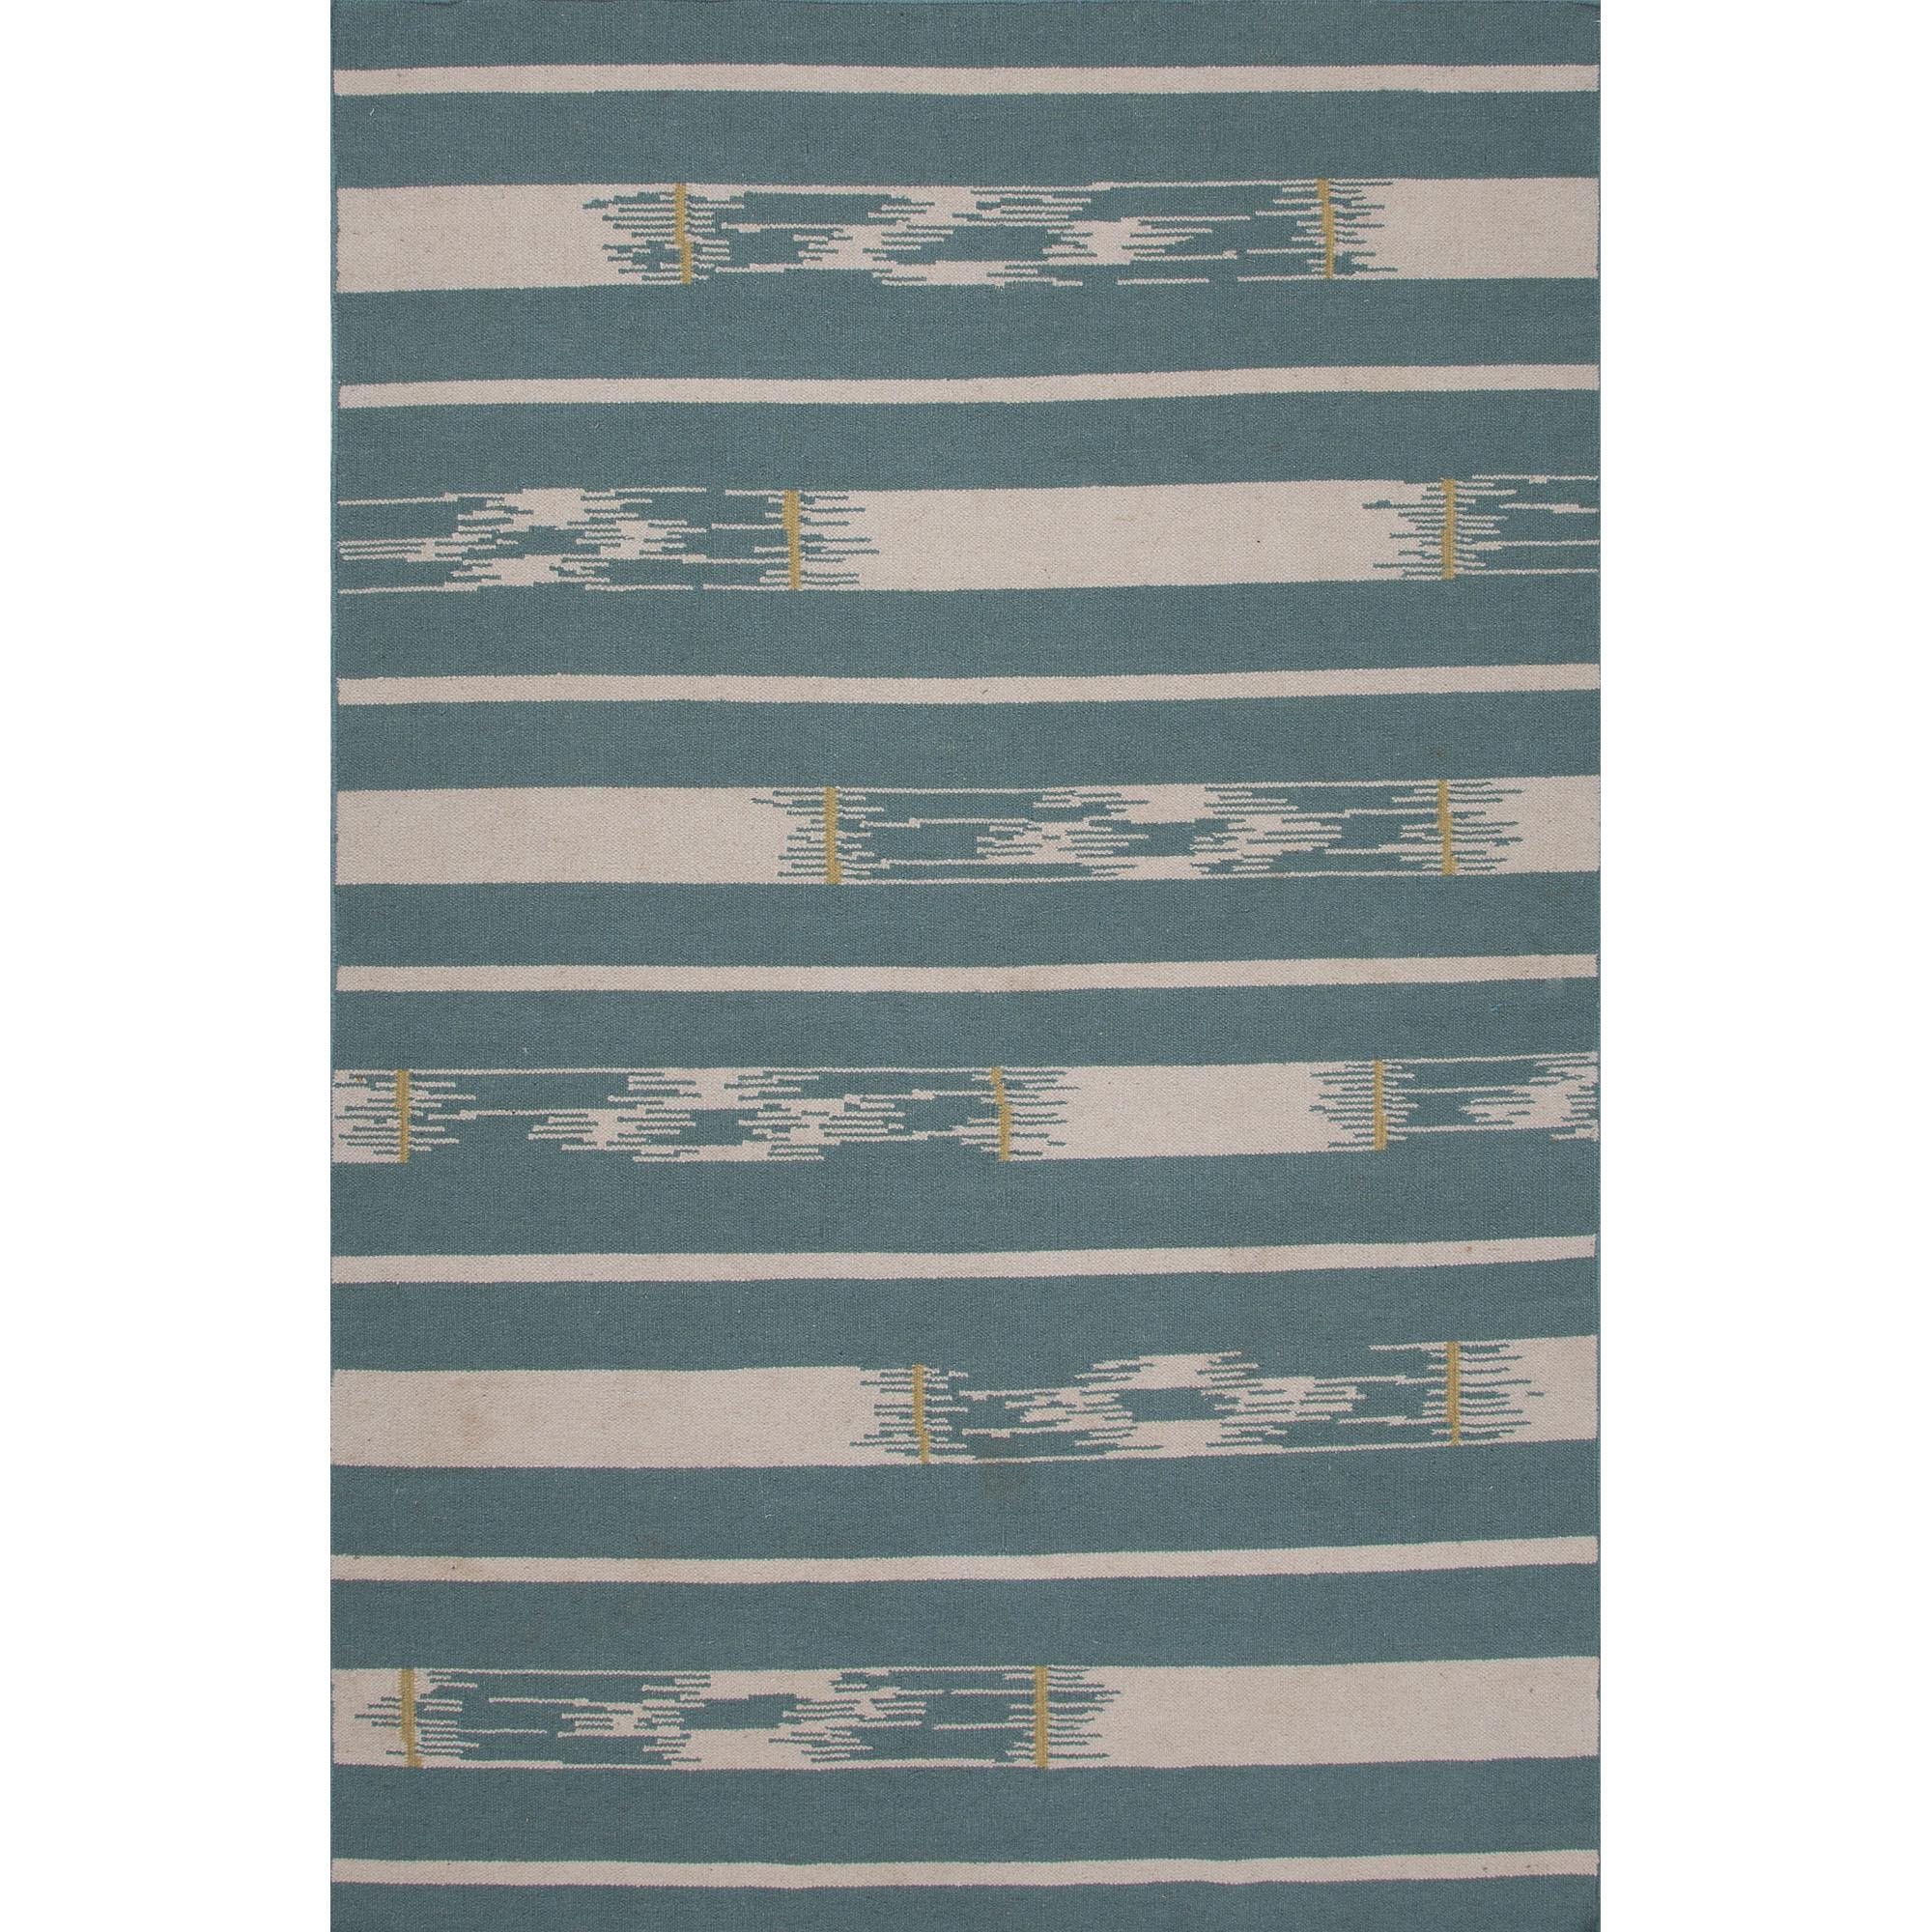 JAIPUR Rugs Traditions Modern Flat Weave 8 x 11 Rug - Item Number: RUG122239